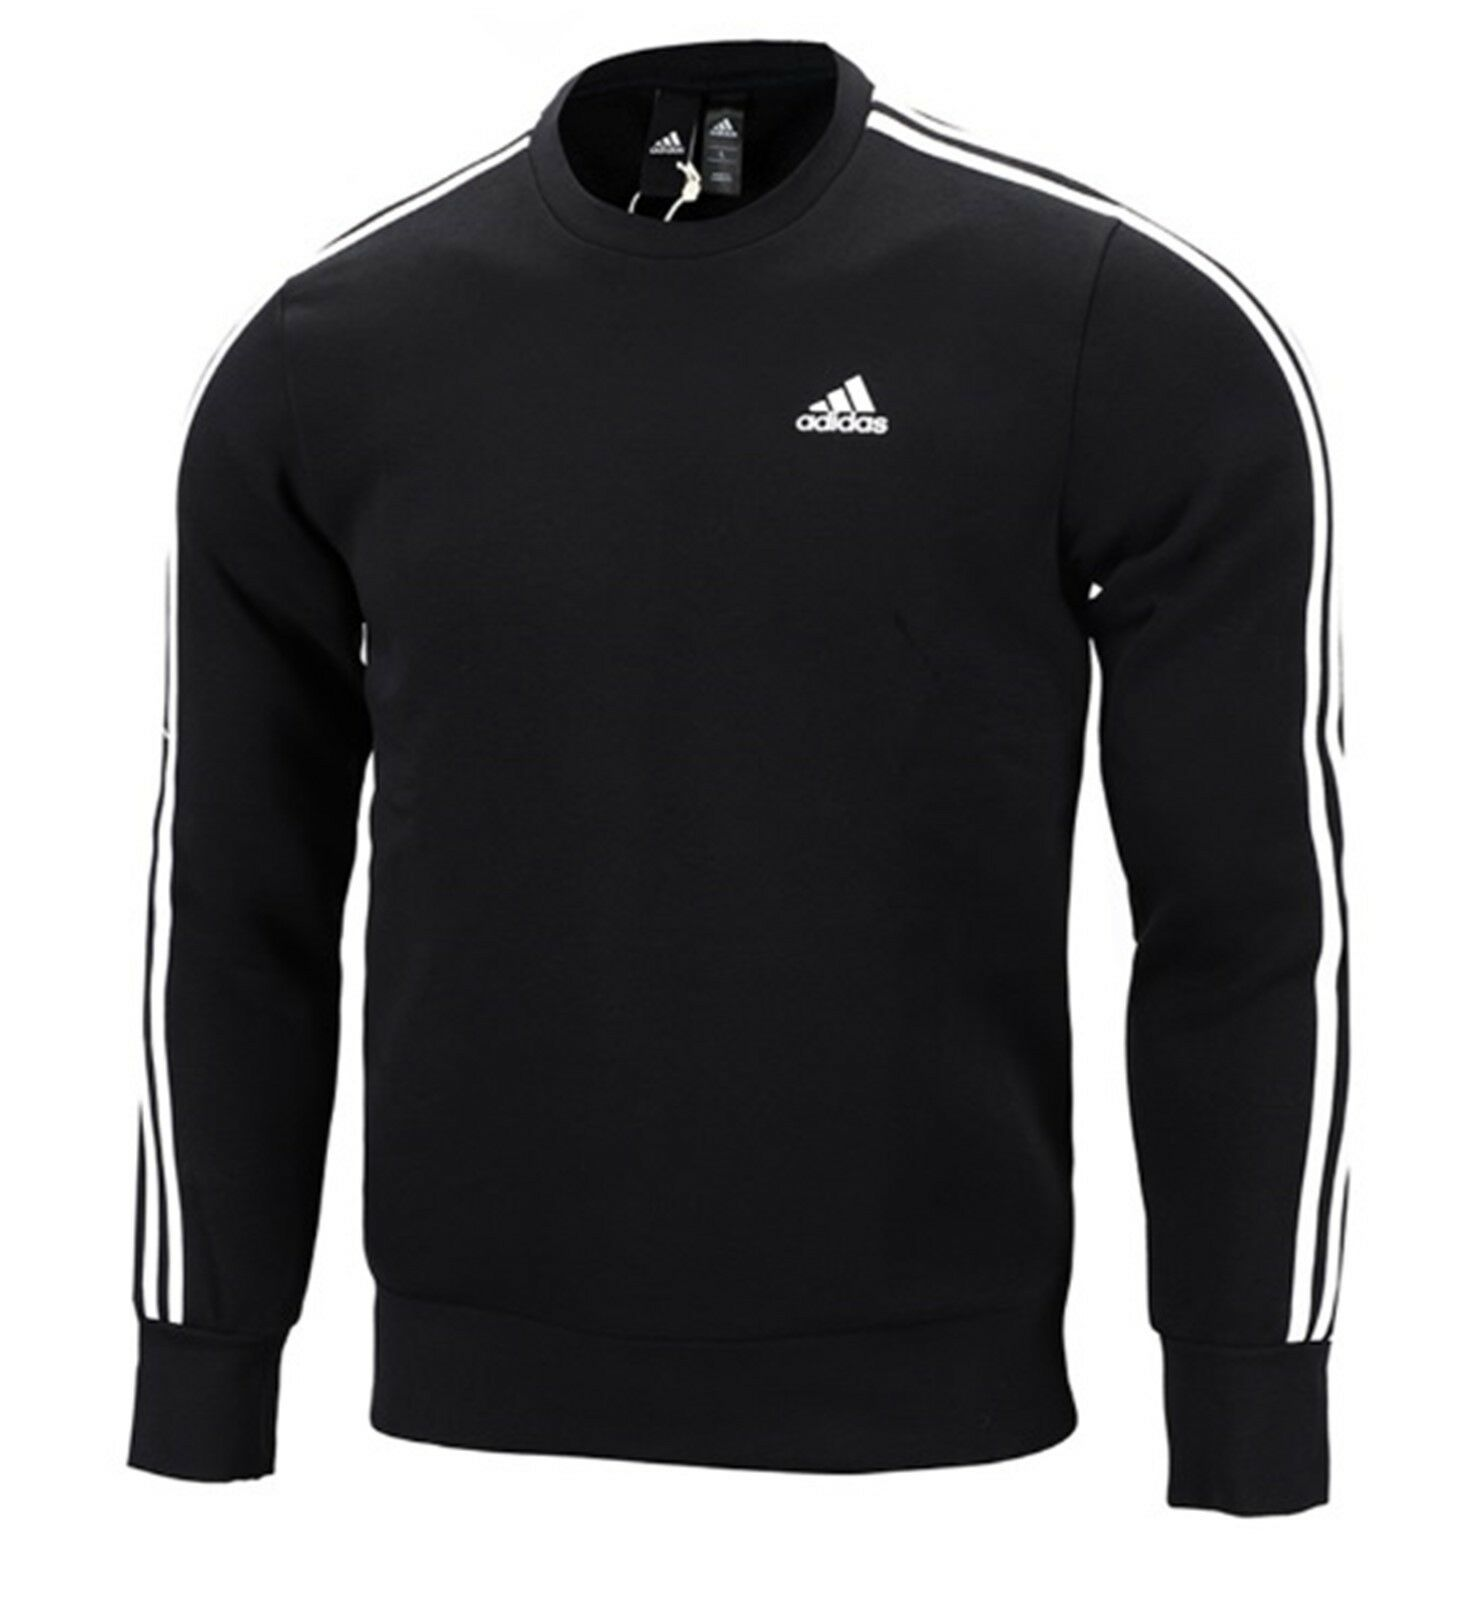 Adidas Hombre Esencial 3S Crew camisas L S Camisa Camiseta